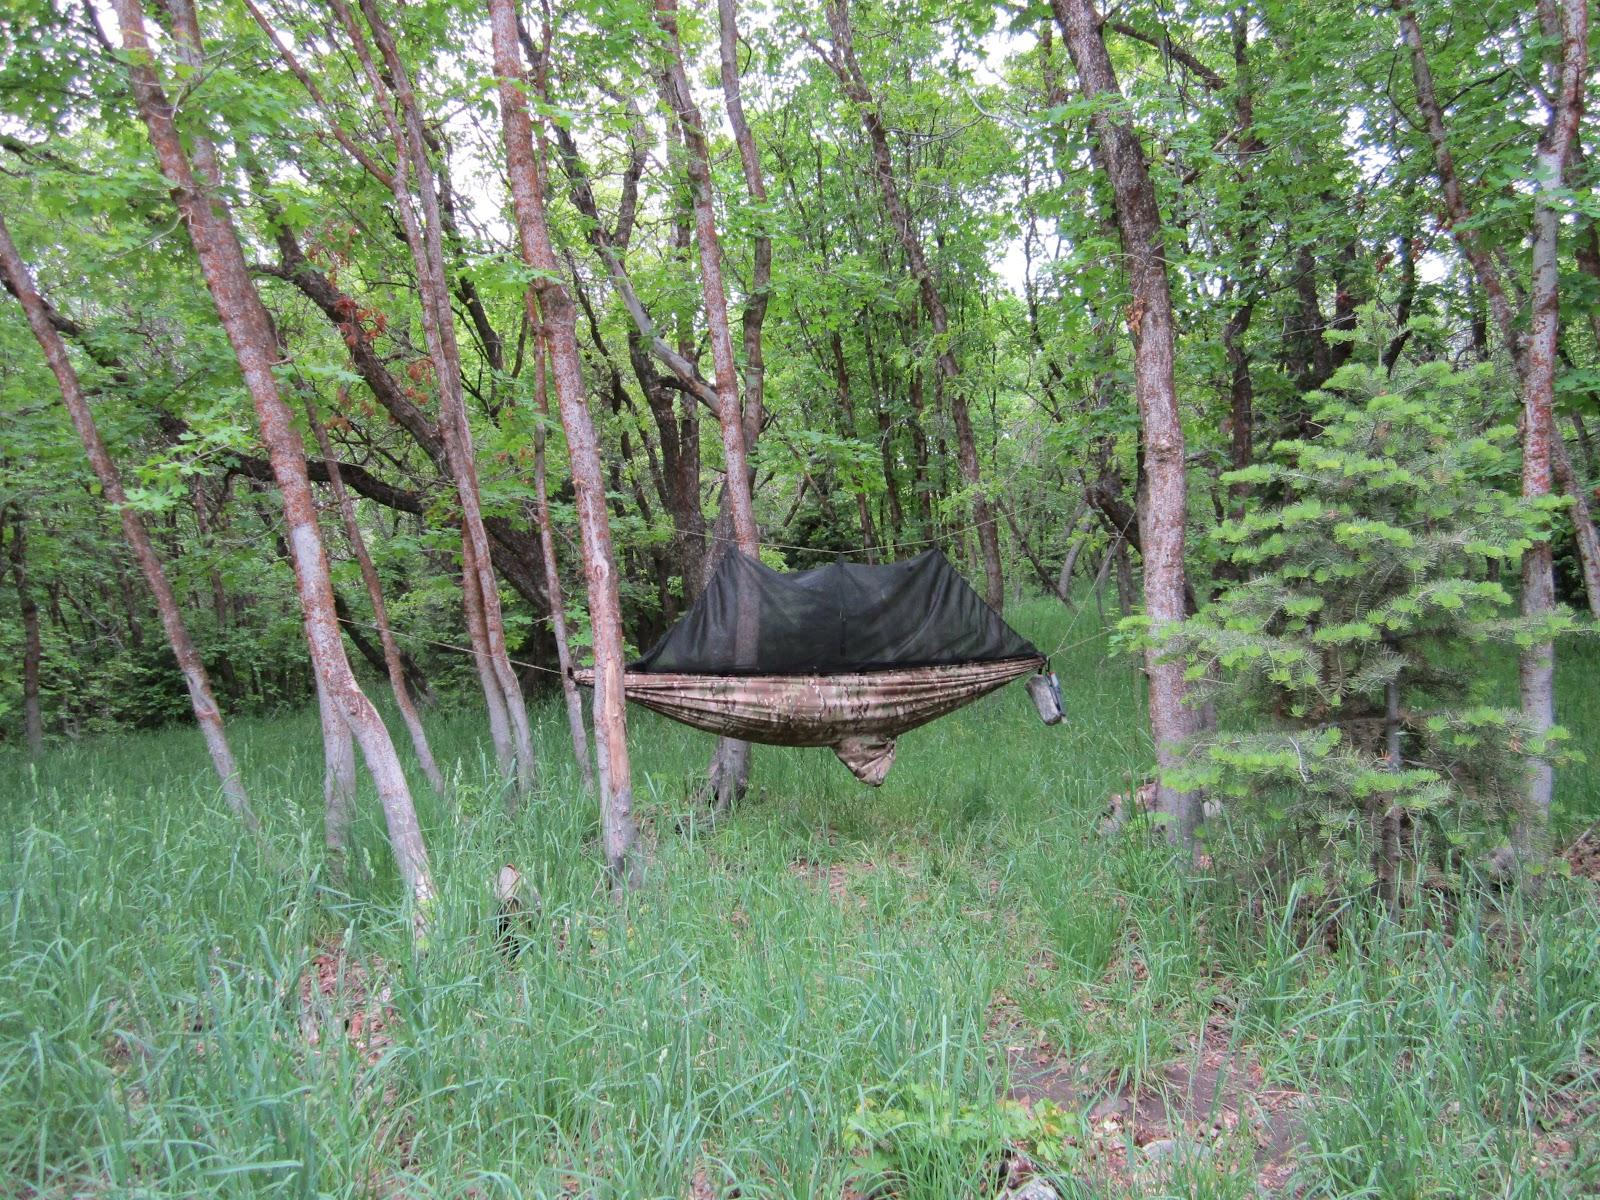 wilderness innovation pss hammock configuration tactical gear and military clothing news   wilderness innovation      rh   blog predatorbdu